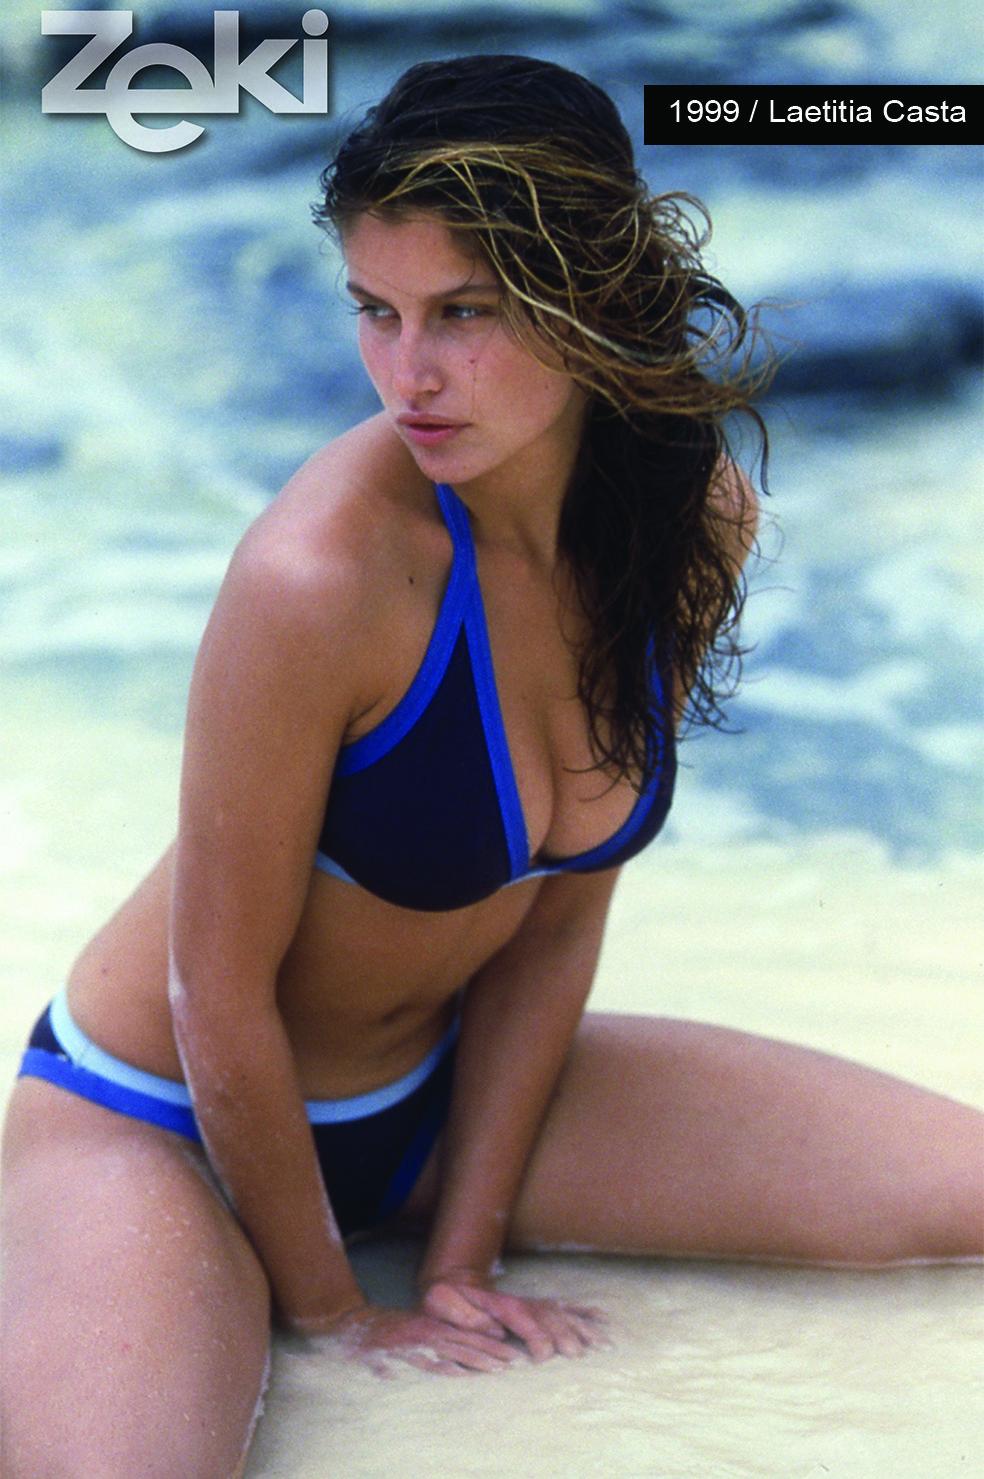 Bikini Laetitia Casta nude (29 photo), Topless, Leaked, Feet, braless 2006